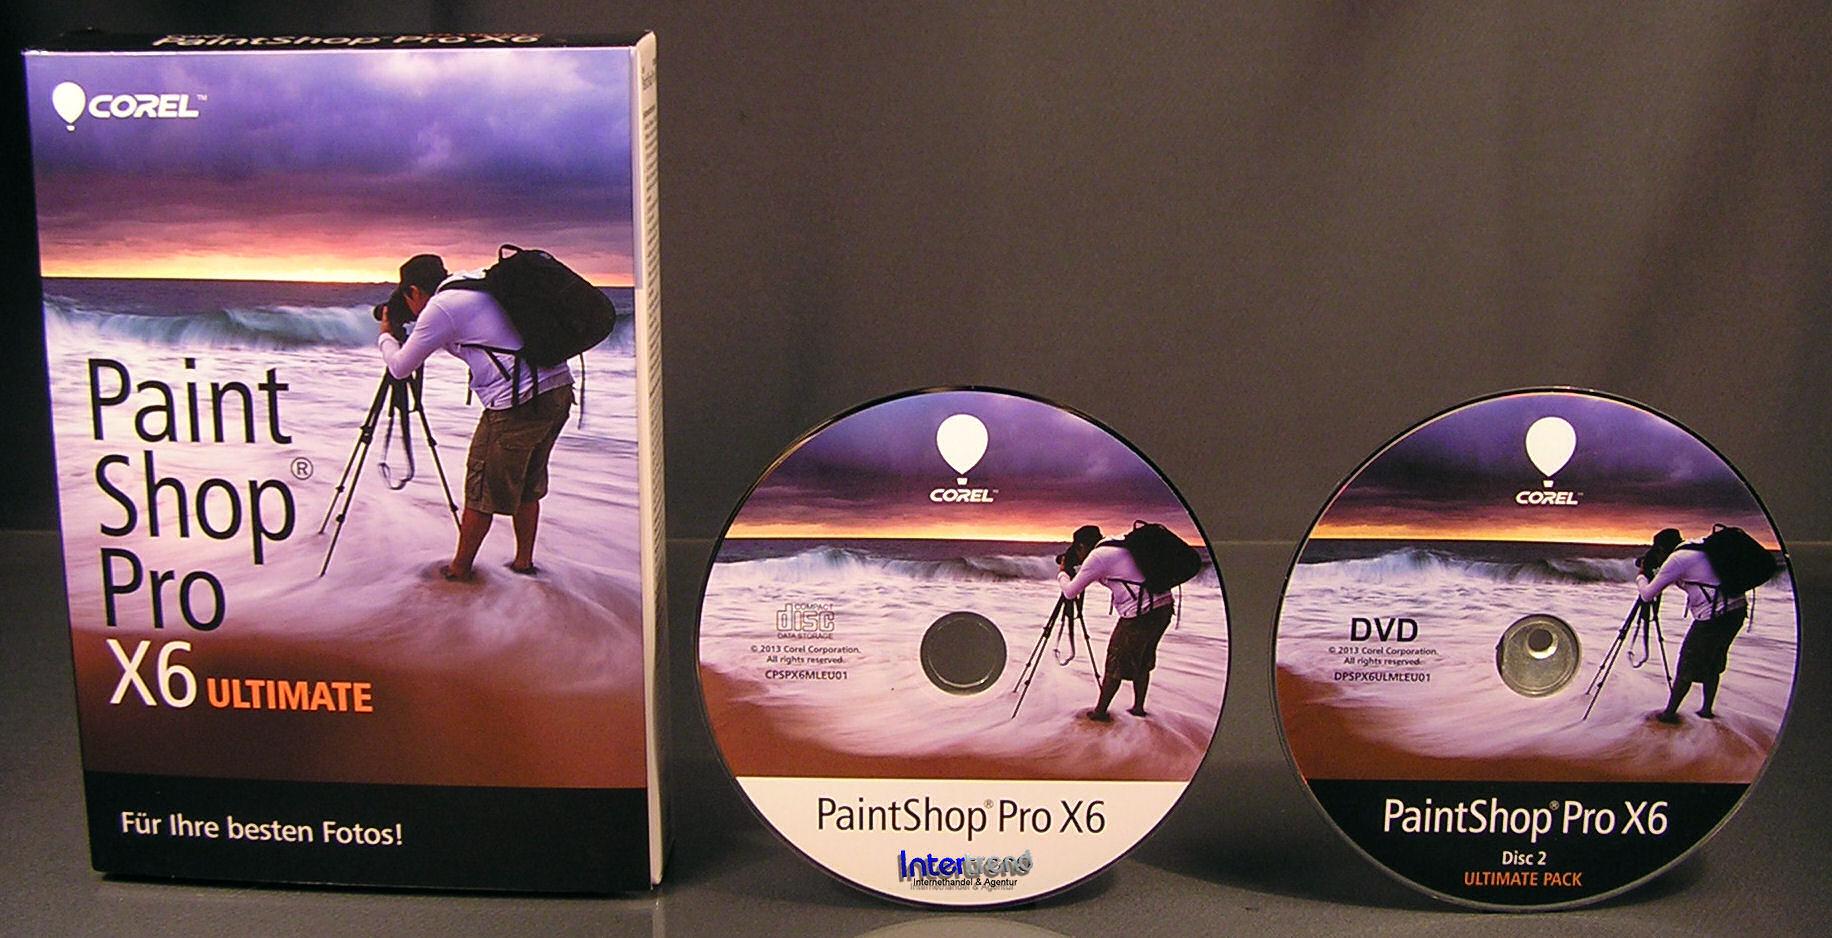 corel paintshop pro x6 ultimate vollversion box cd handbuch pdf ovp neu ebay. Black Bedroom Furniture Sets. Home Design Ideas